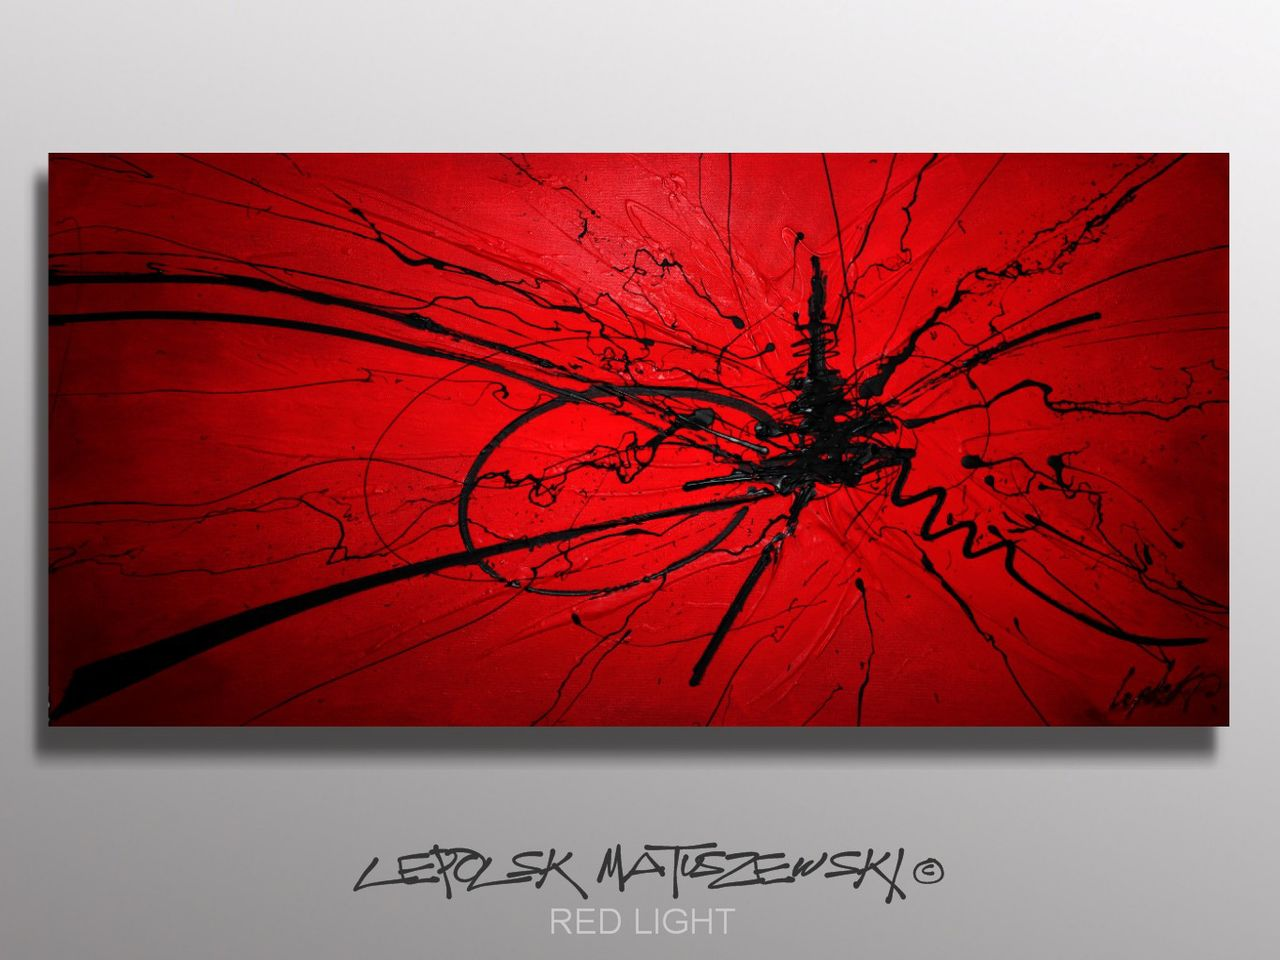 MK  Lepolsk Matuszewski RED LIGHT   Expressionnisme abstrait contemporain